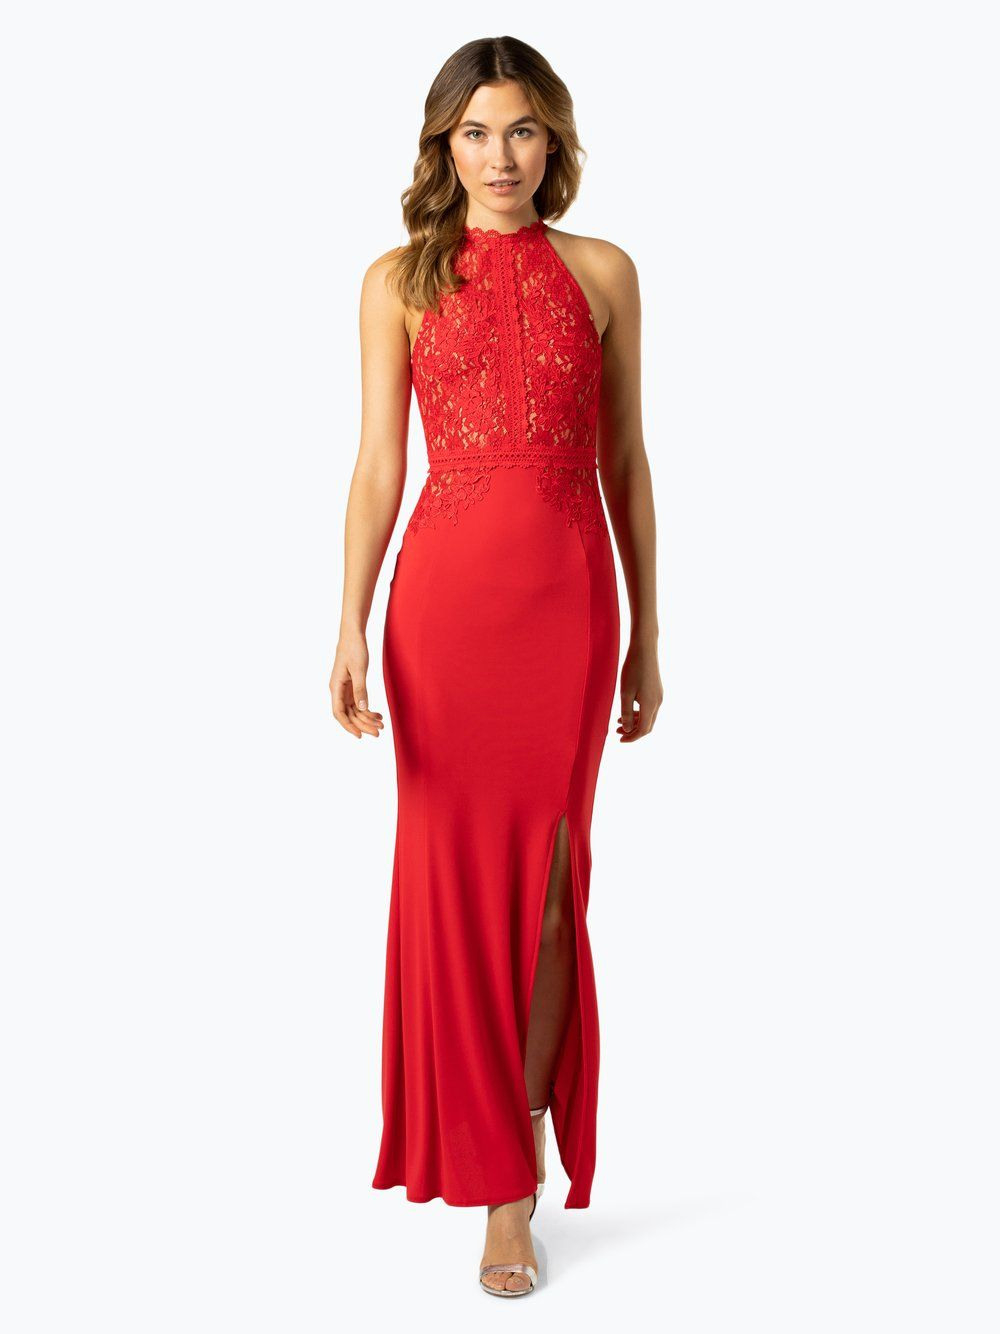 9 Luxus Lipsy Abendkleid Vertrieb - Abendkleid